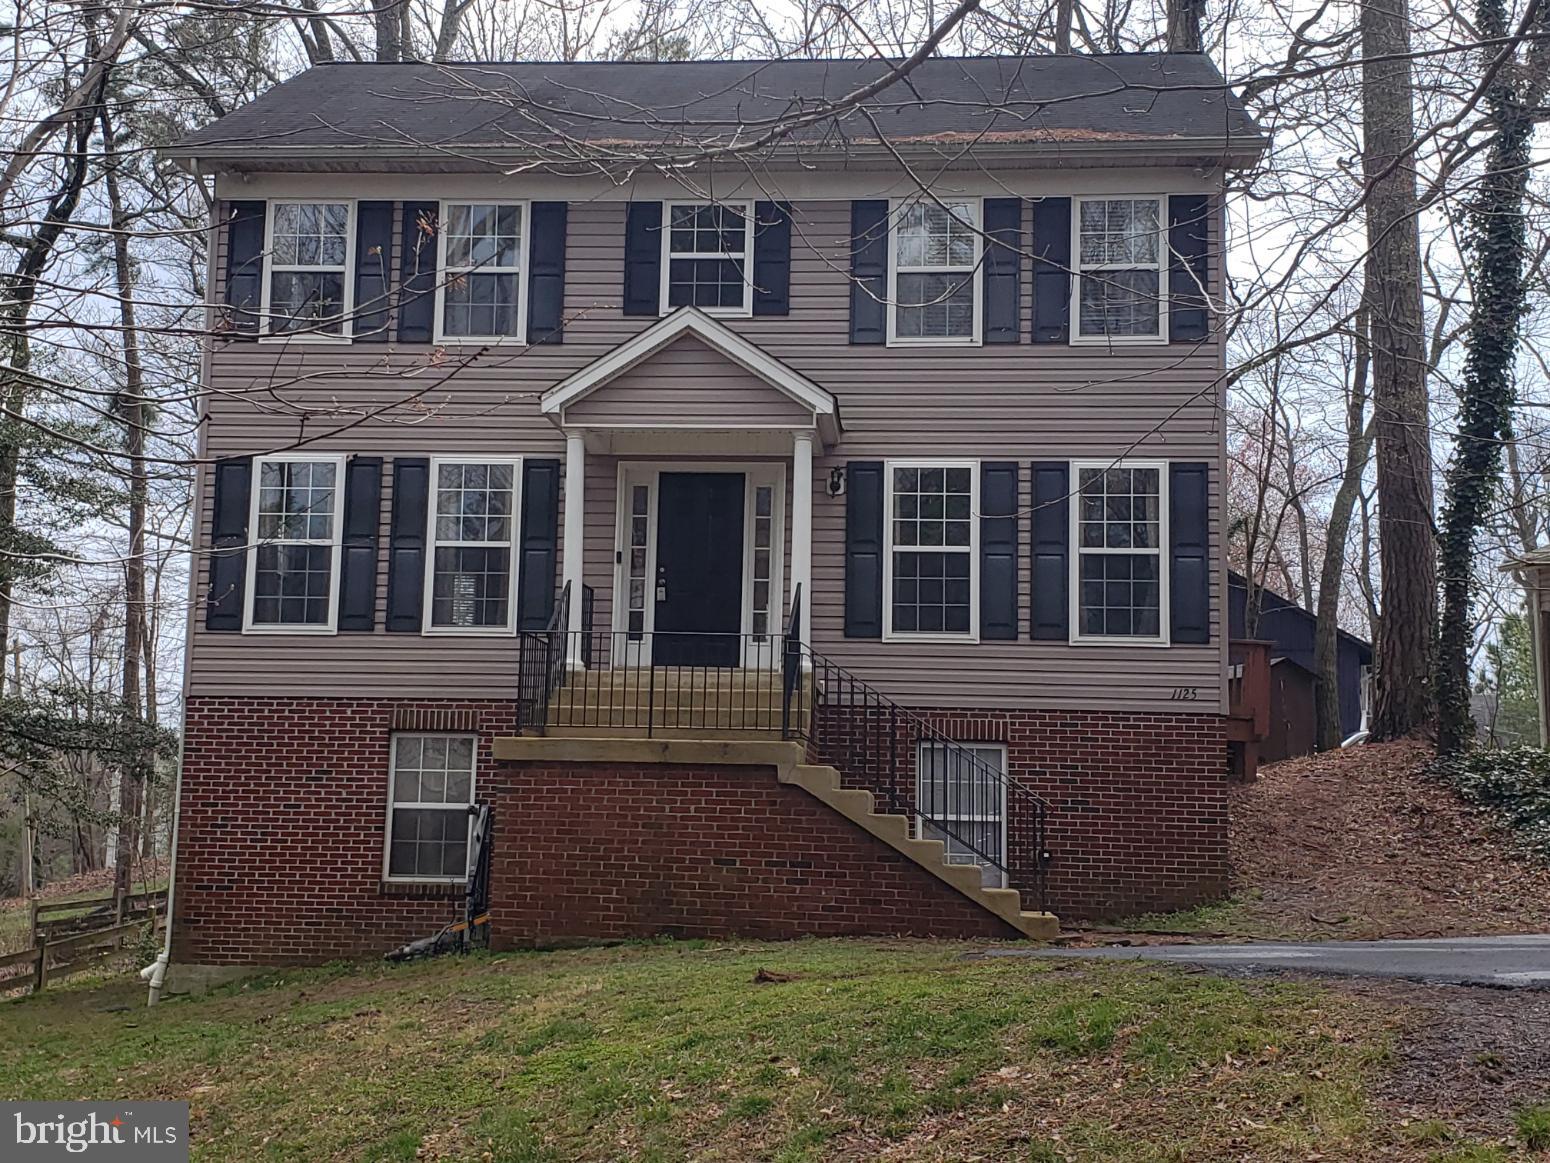 1125 RENO LANE, LUSBY, Maryland 20657, 3 Bedrooms Bedrooms, ,3 BathroomsBathrooms,Single Family,For Sale,1125 RENO LANE,MDCA181880